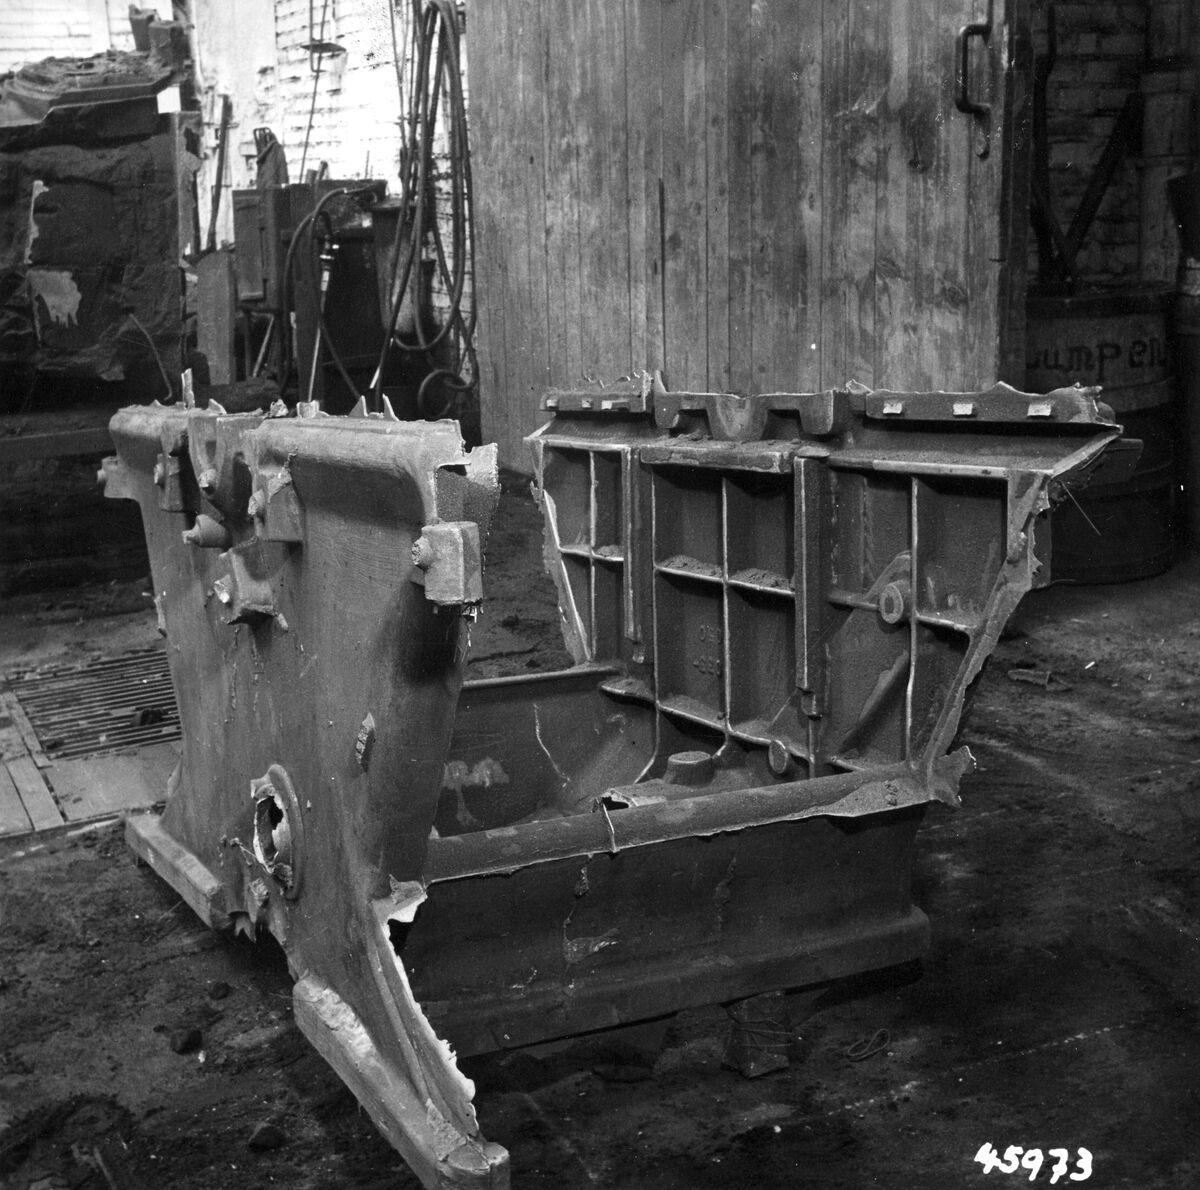 GFA 12/45973: Reportage casting process in malleable casting